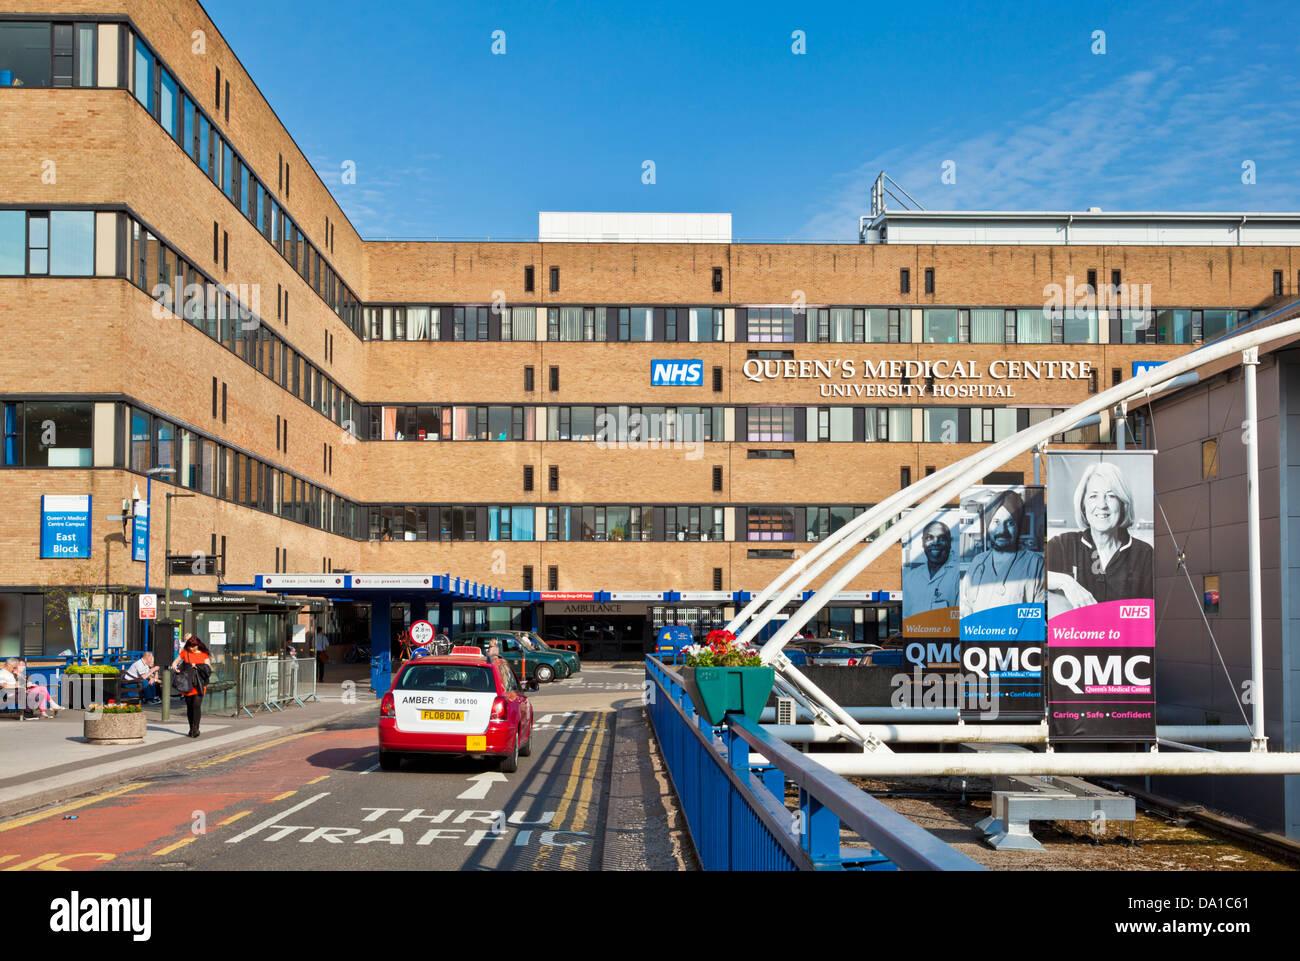 Queens Medical Centre Nottingham Nottinghamshire east midlands England UK GB EU Europe - Stock Image